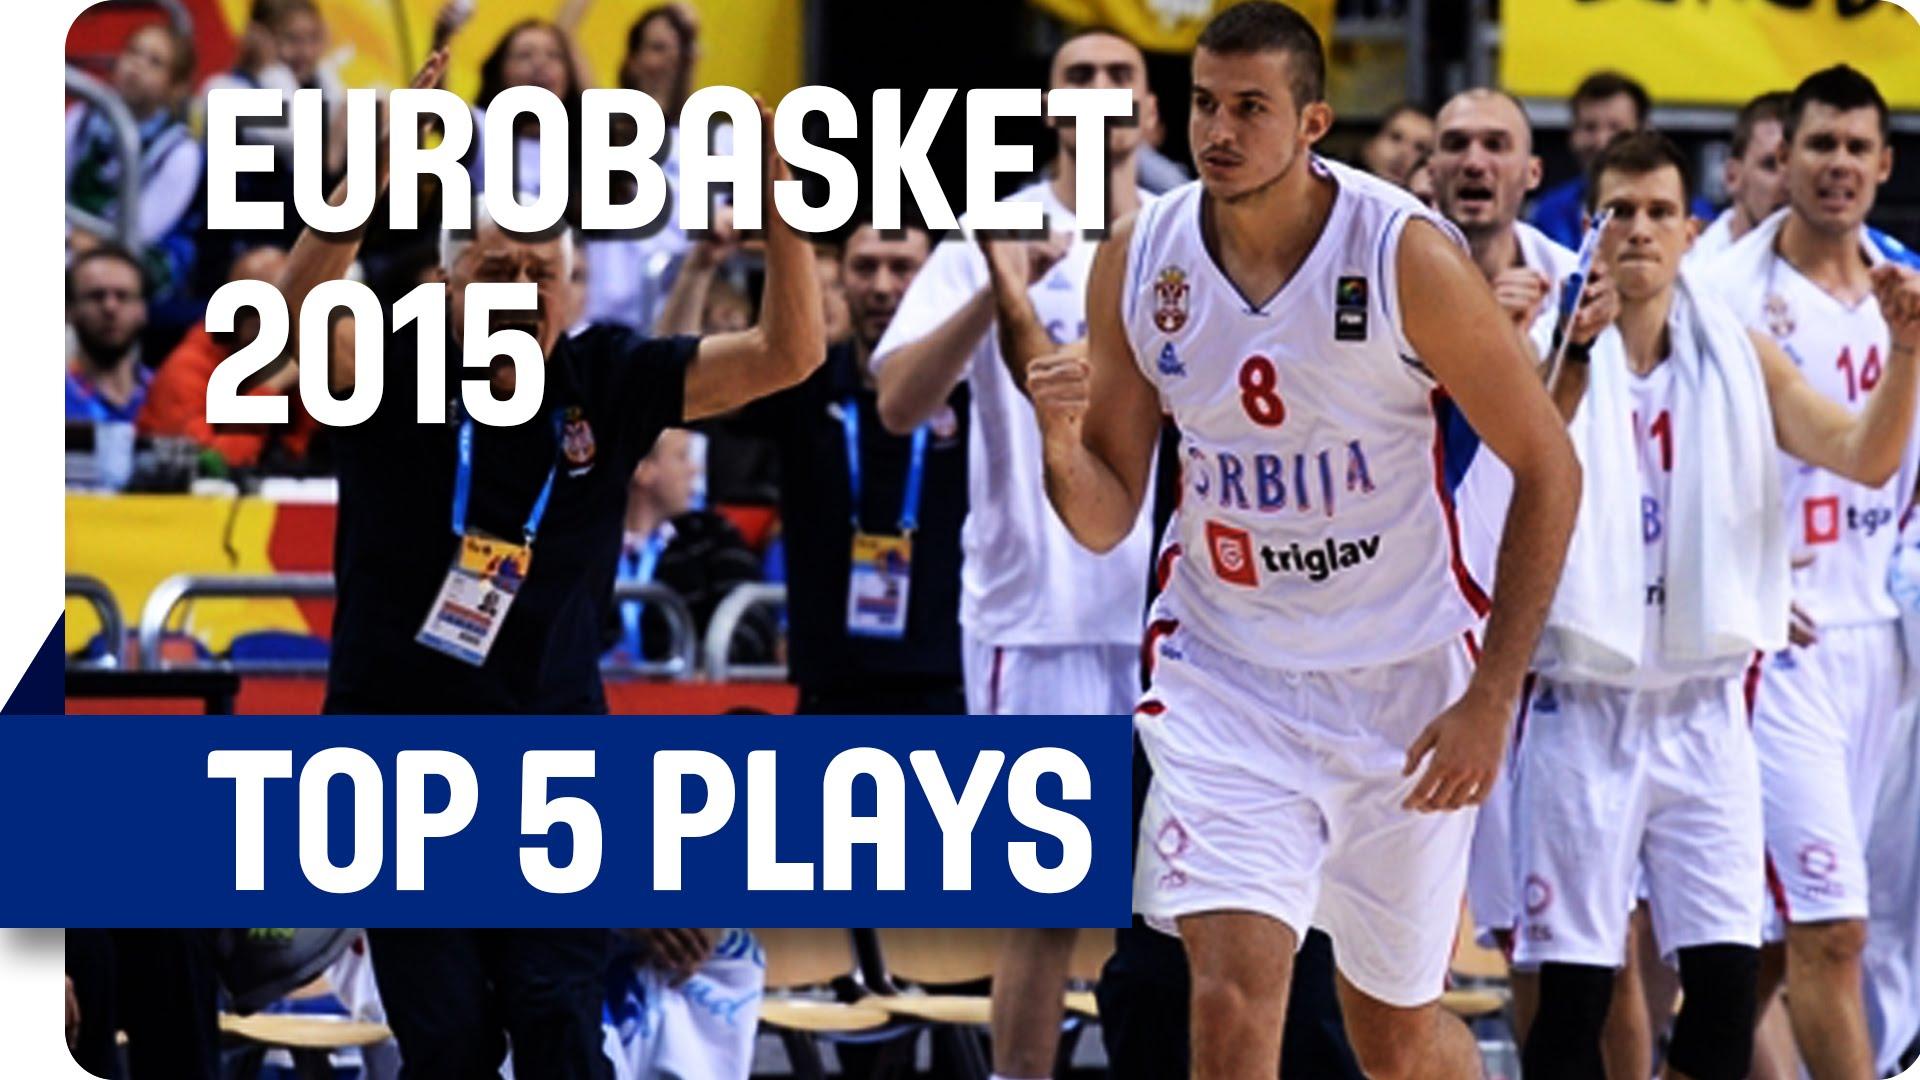 [Eurobasket] Top 5: Nicolas Batum numéro 1